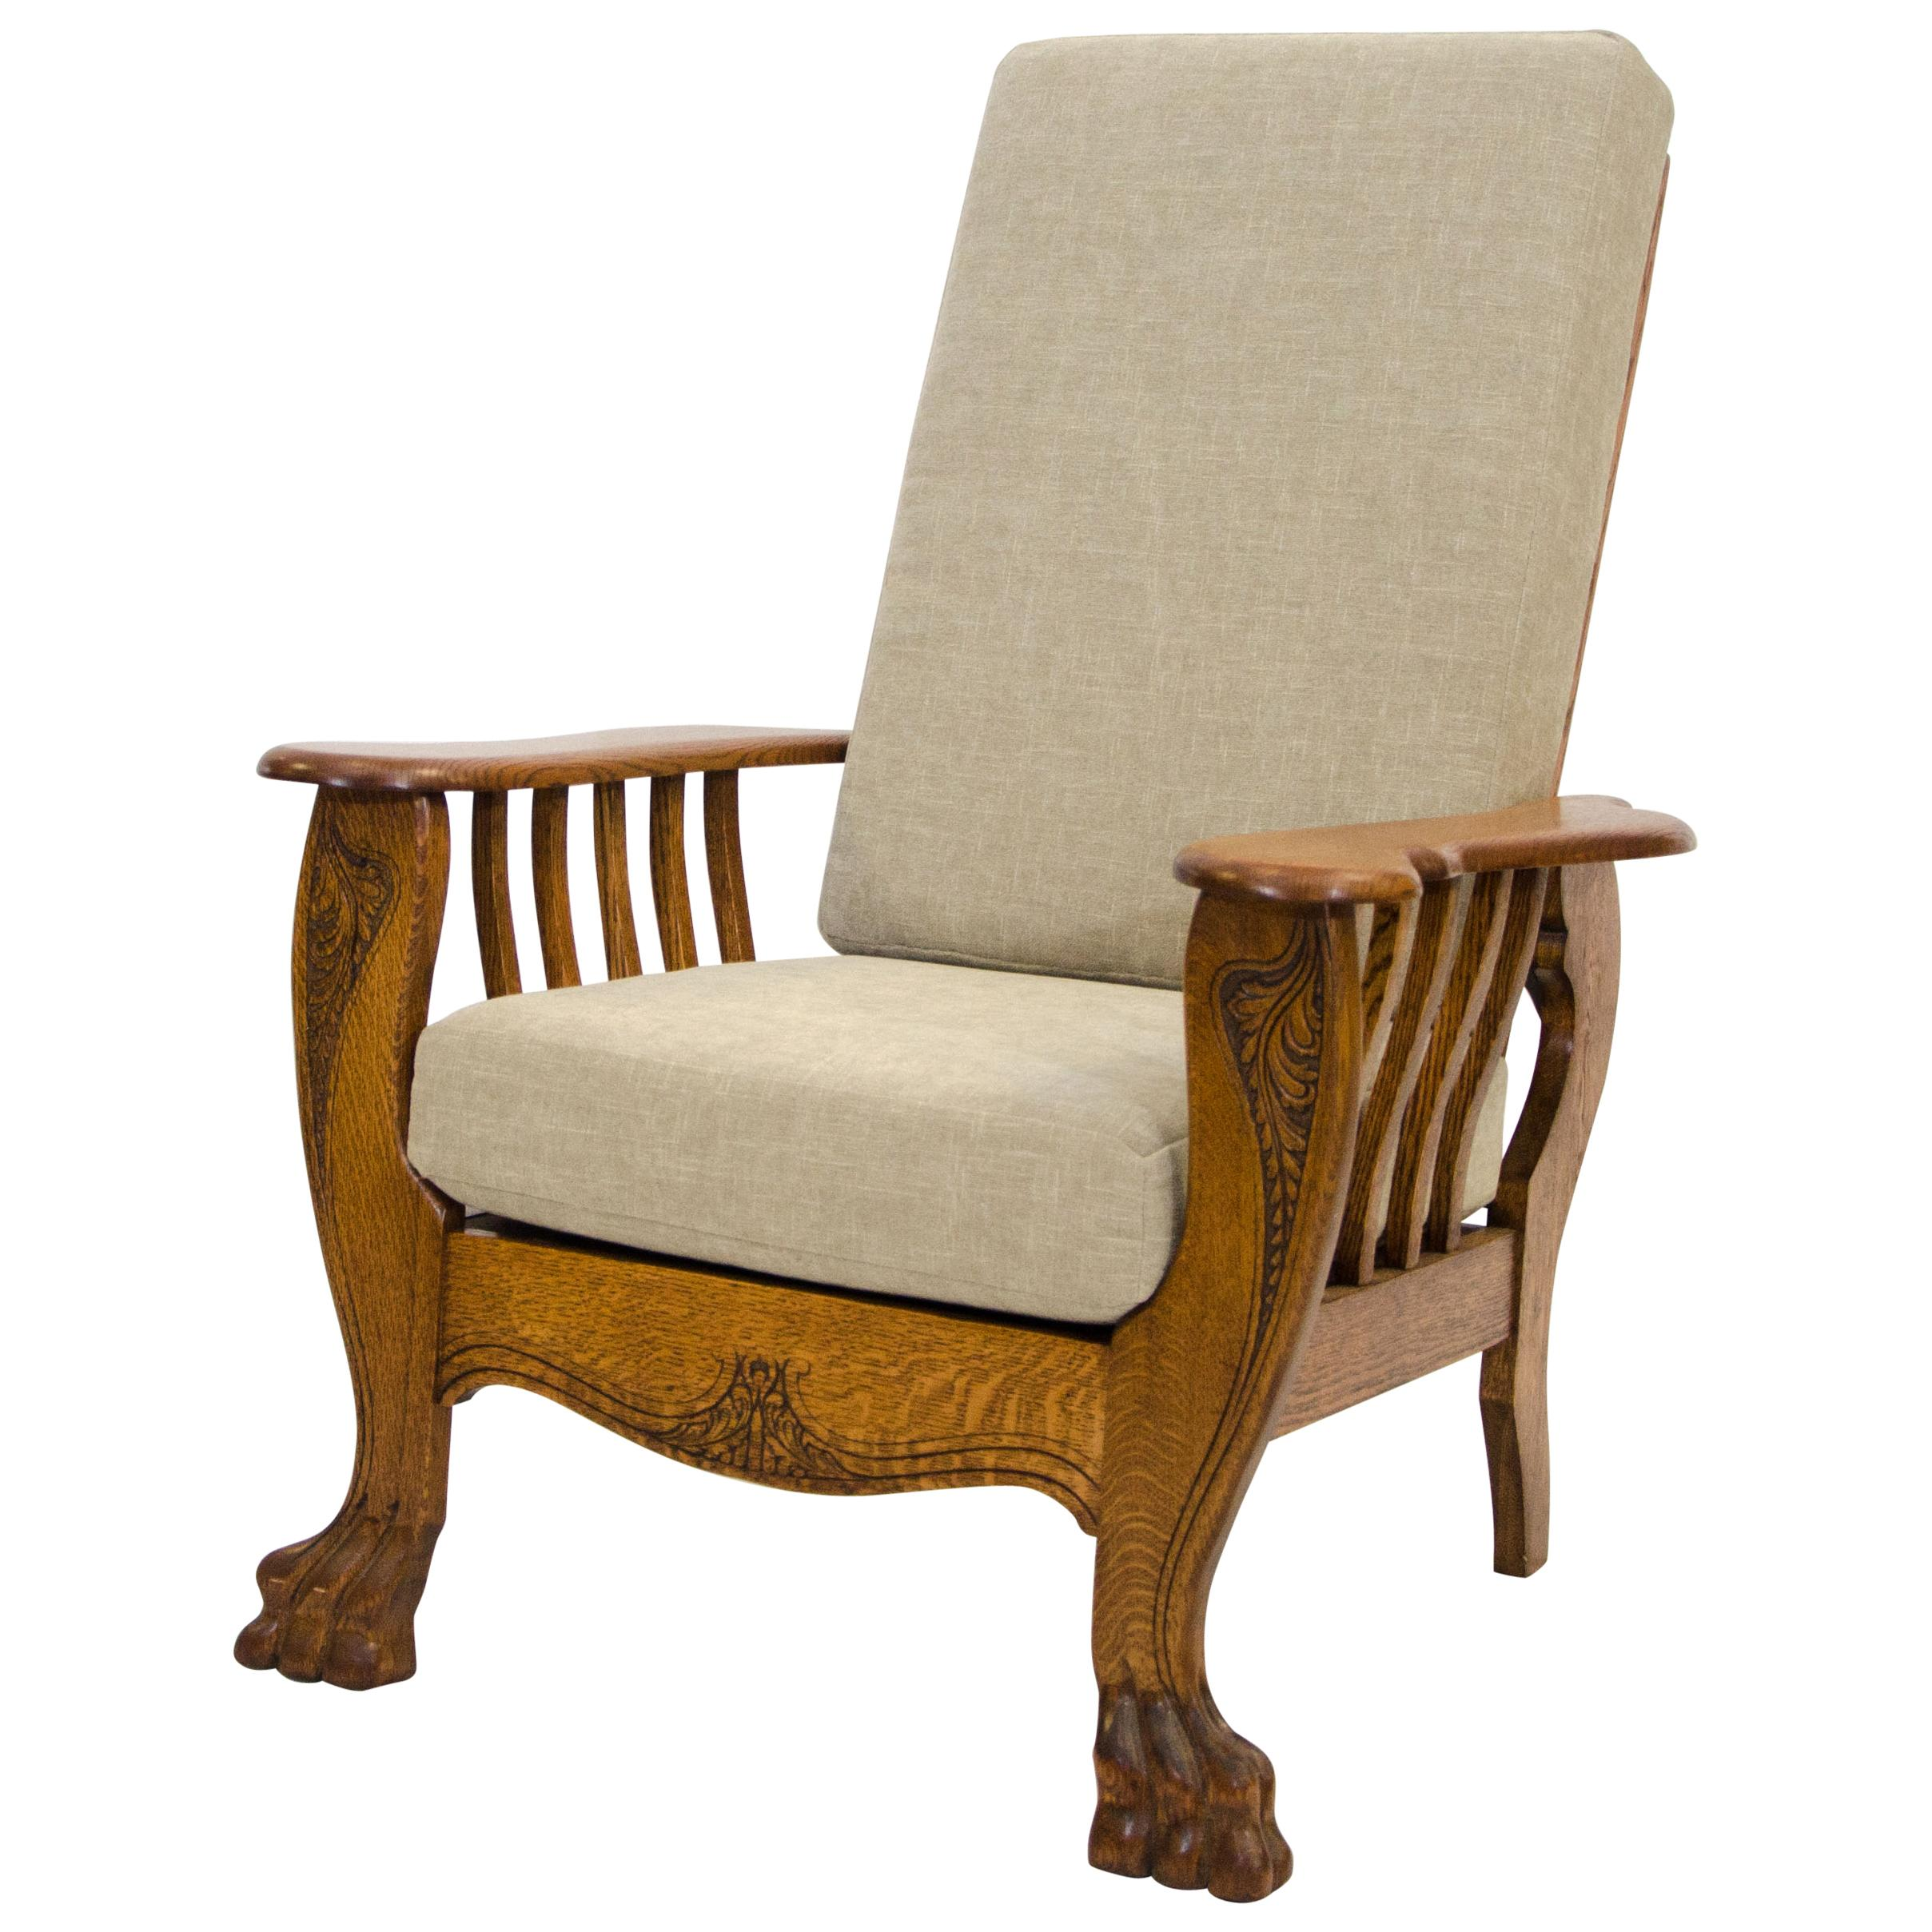 High Back Antique Oak Morris Reclining Chair Claw Feet  sc 1 st  1stDibs & Morris Chair Recliner For Sale at 1stdibs